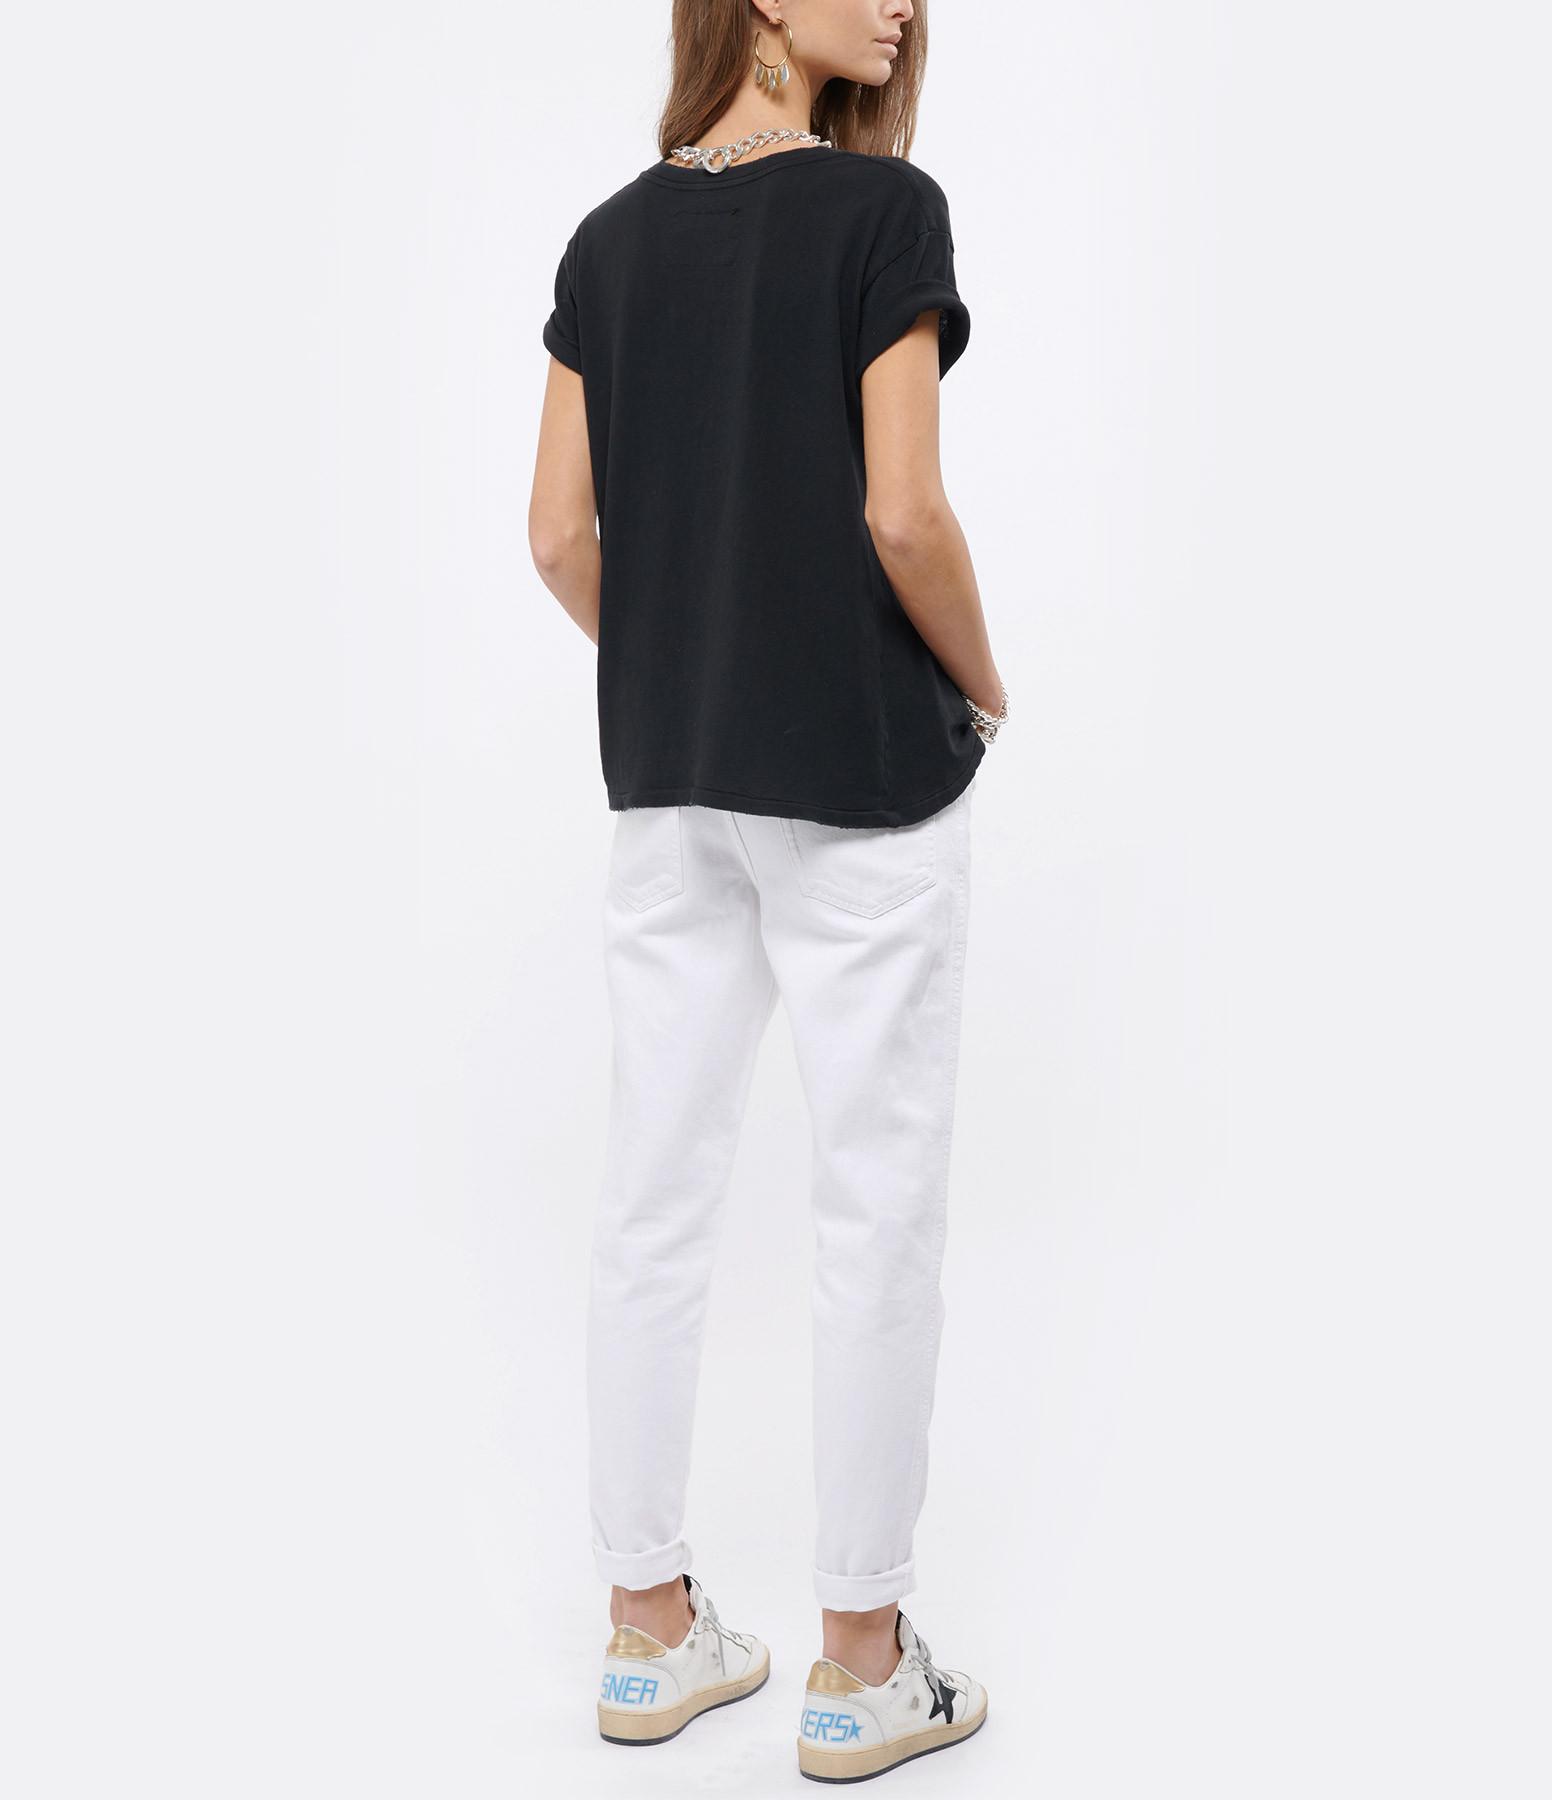 NILI LOTAN - Tee-shirt Nili Lotan Brady Noir Délavé